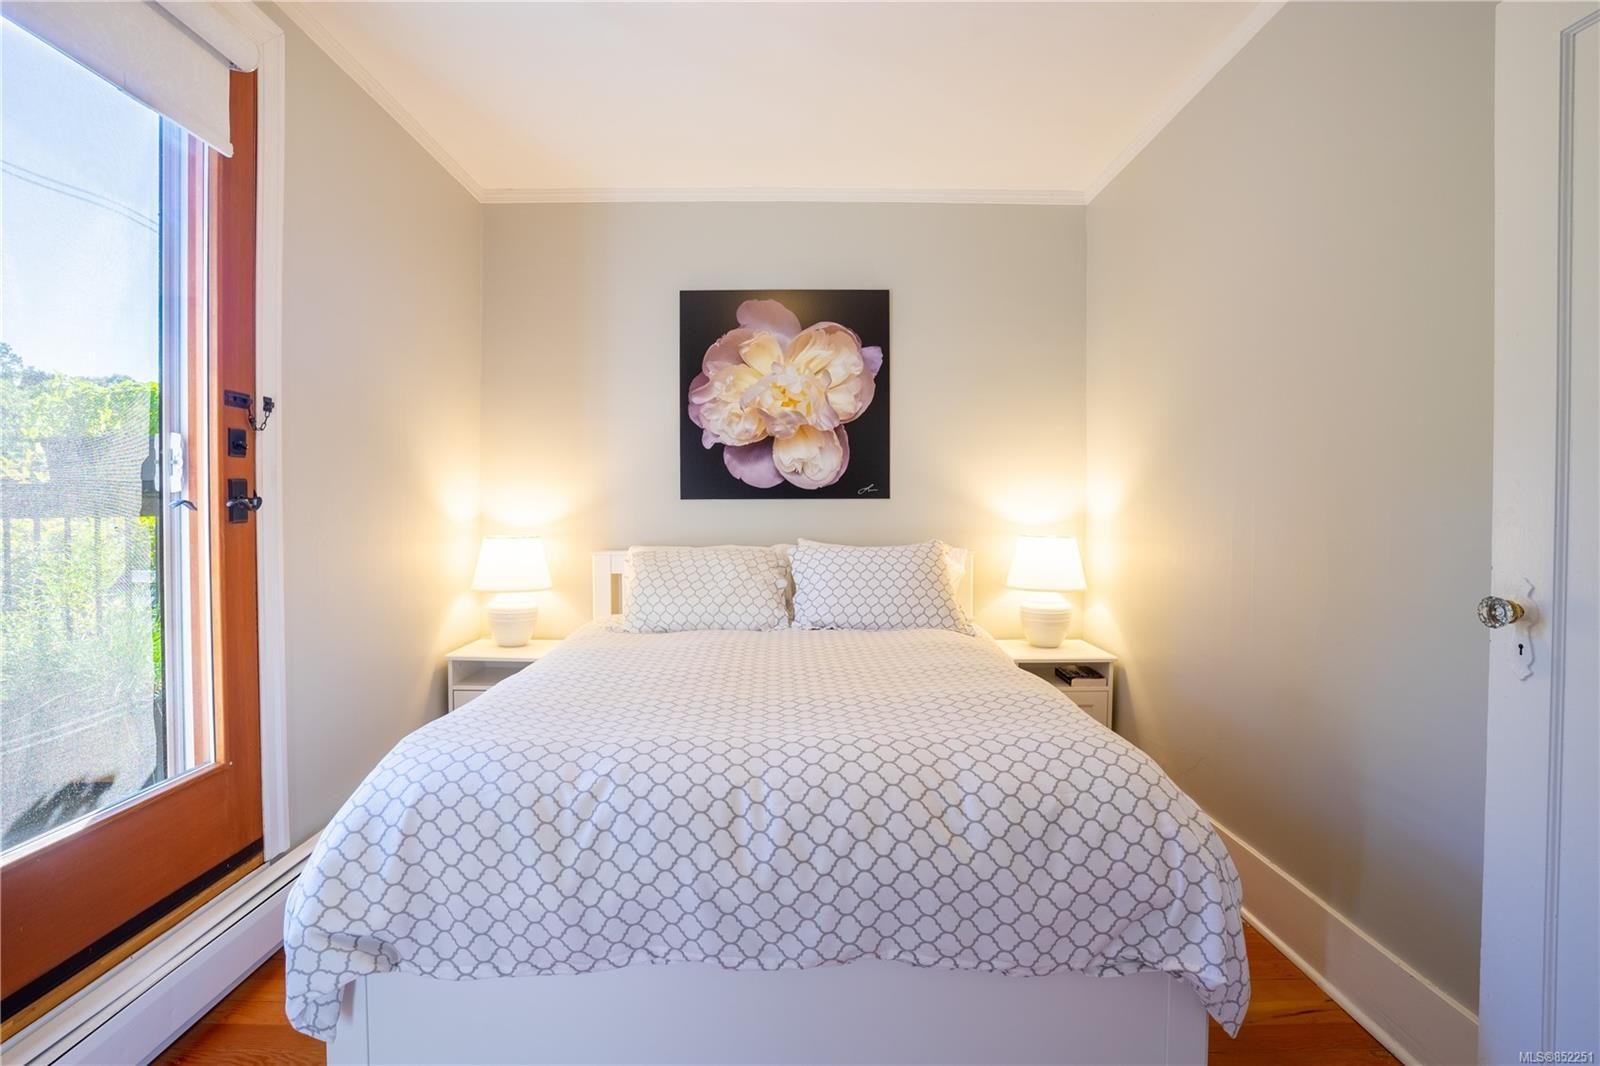 Photo 15: Photos: 2363 Pacific Ave in : OB Estevan House for sale (Oak Bay)  : MLS®# 852251